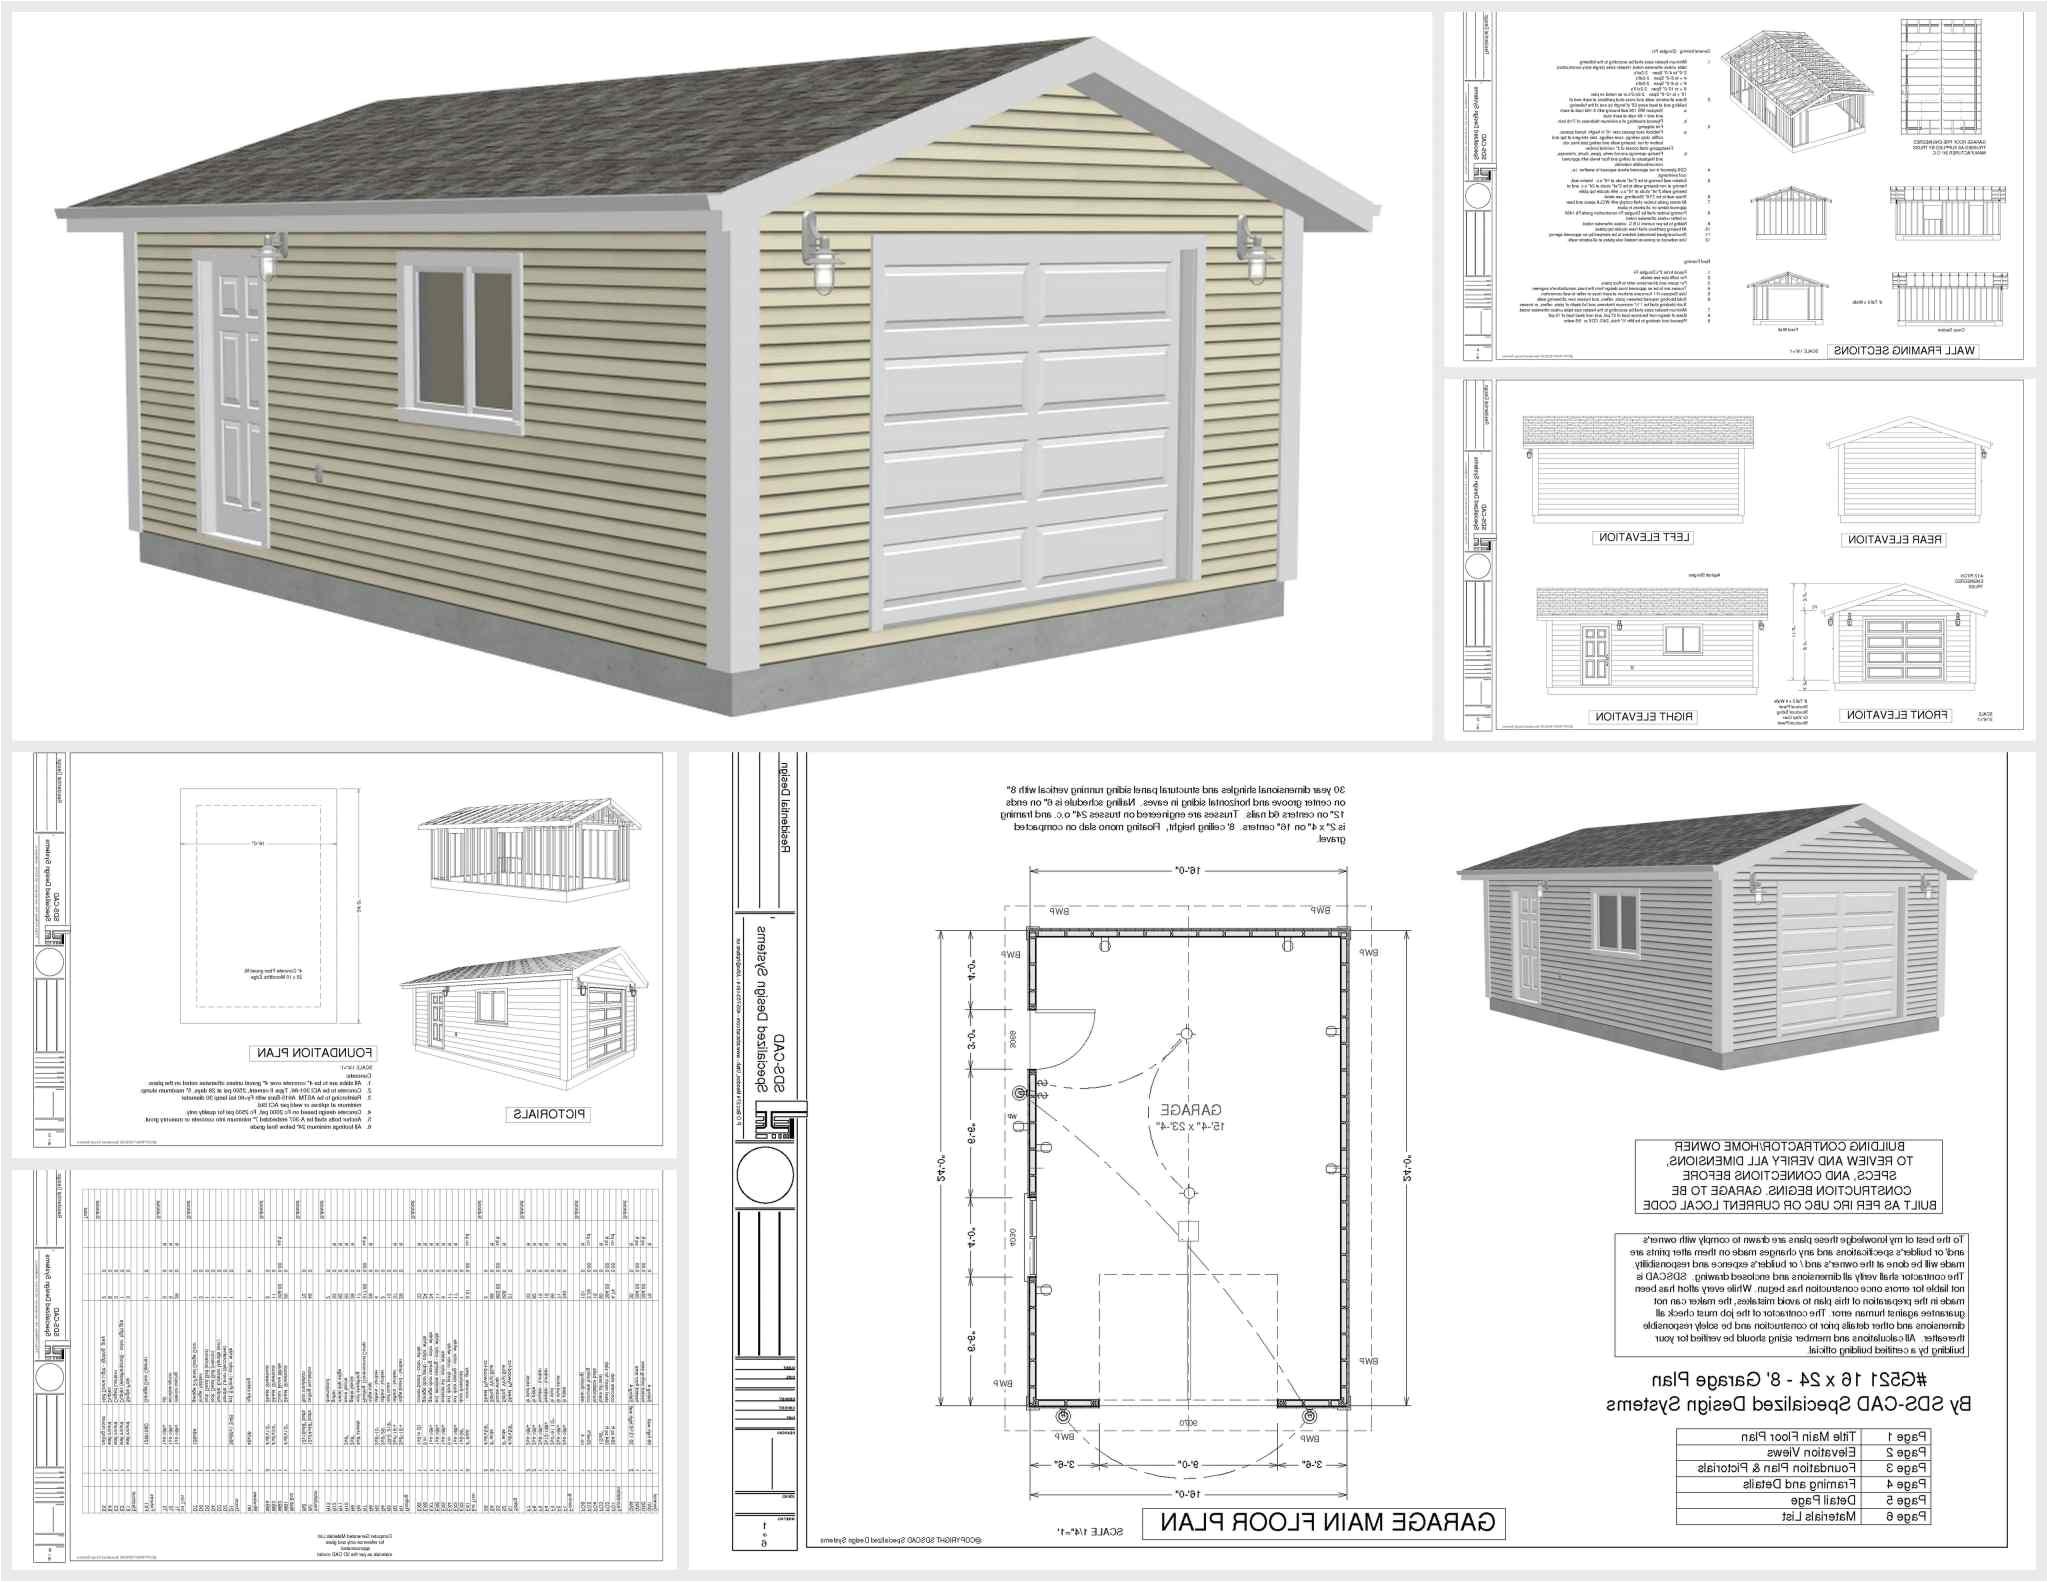 best dog kennels unique simple dog house plans dog kennel floor plans cheap dog house ideas